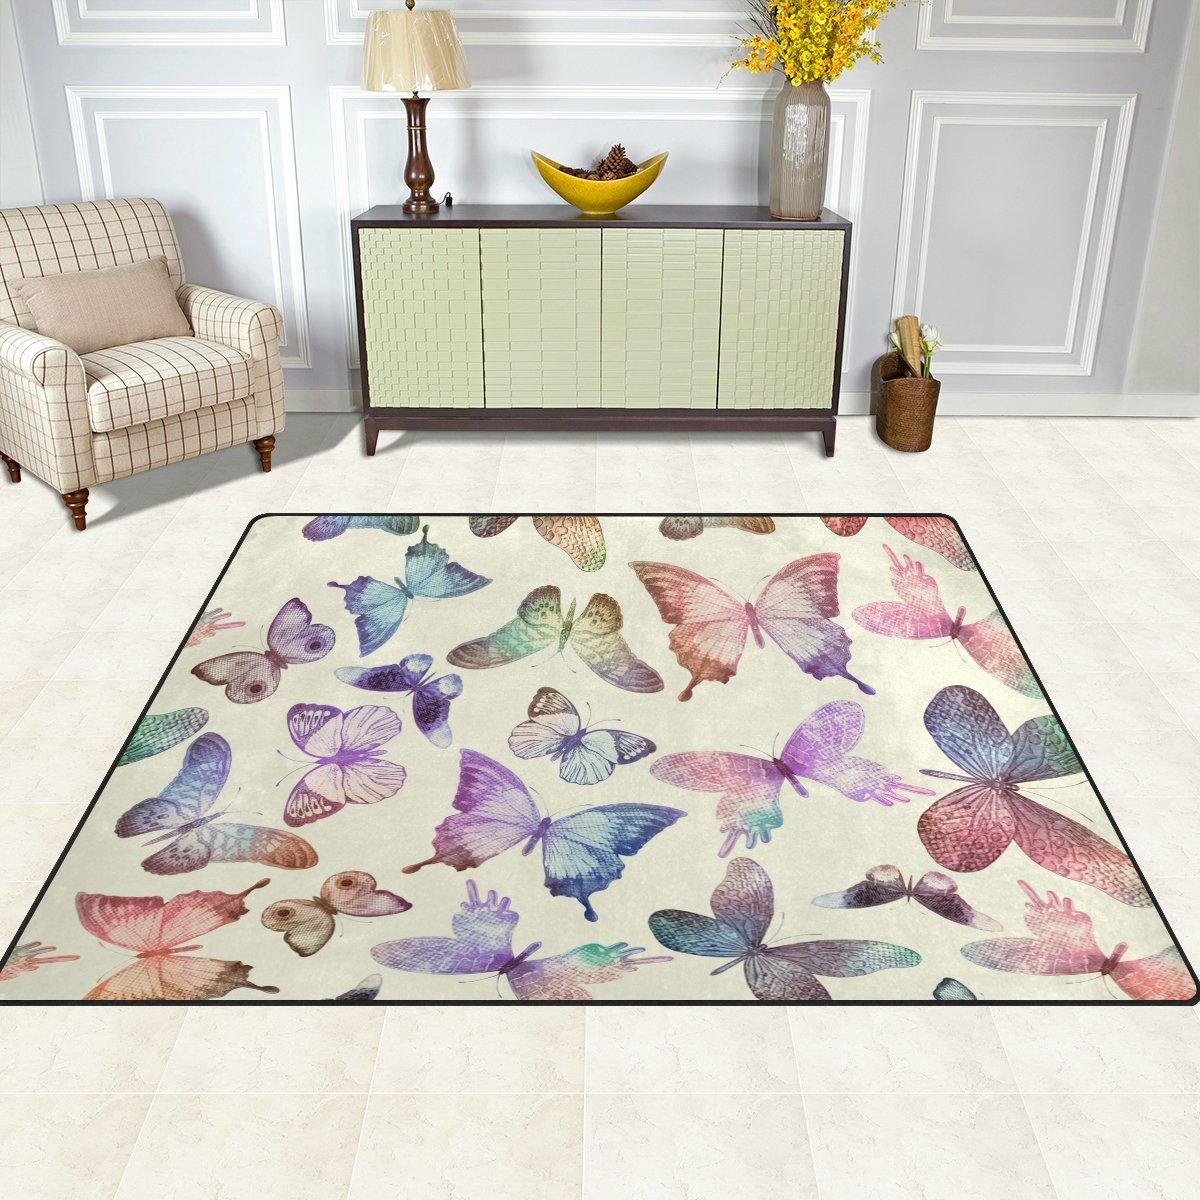 Amazon.com: Top Carpenter volando mariposas área alfombra ...